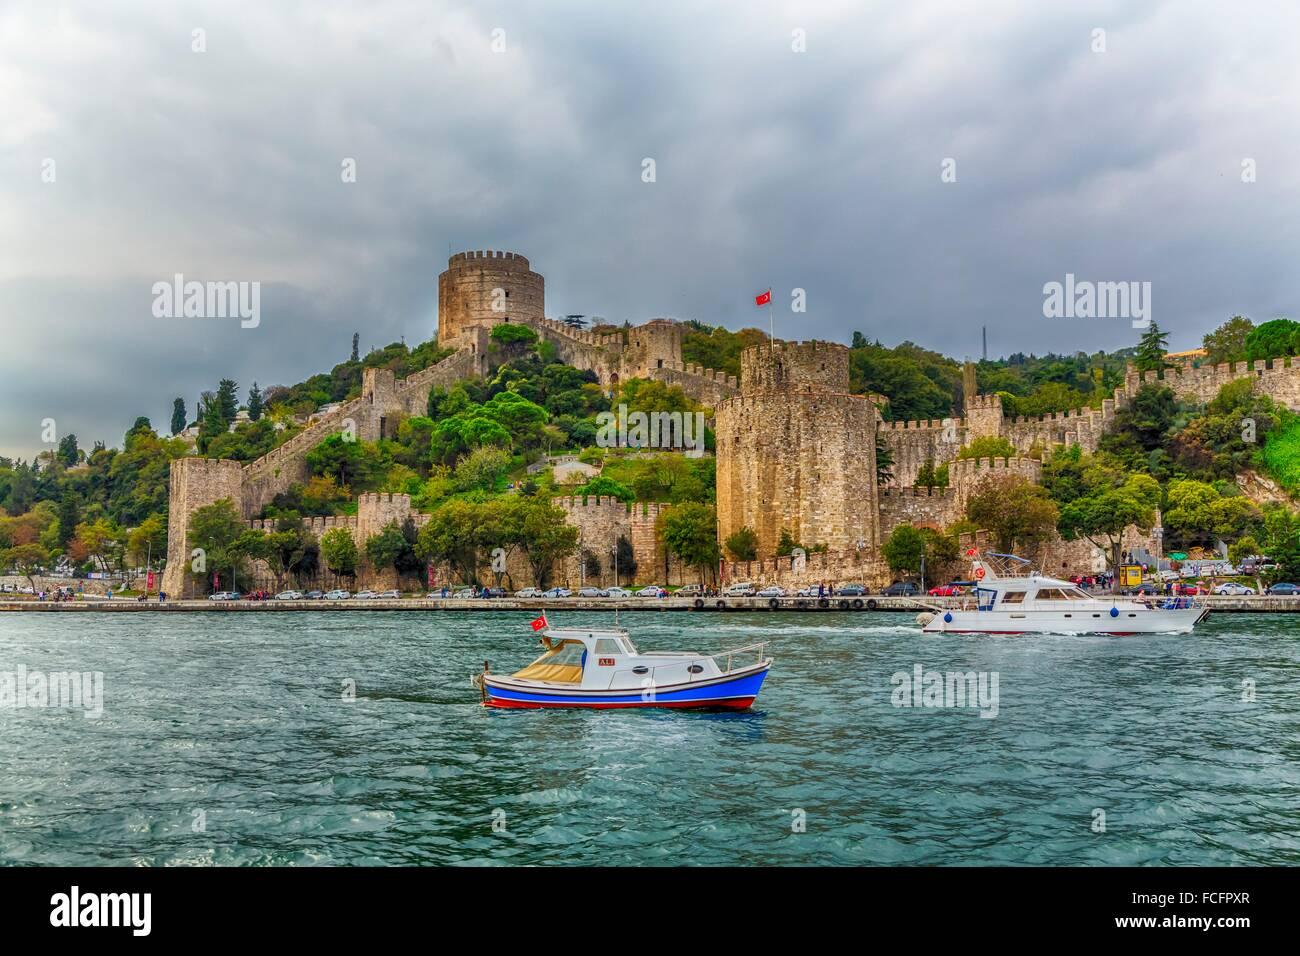 The Rumelihisar Castle along the Bosphorus near Istanbul, Turkey. Stock Photo